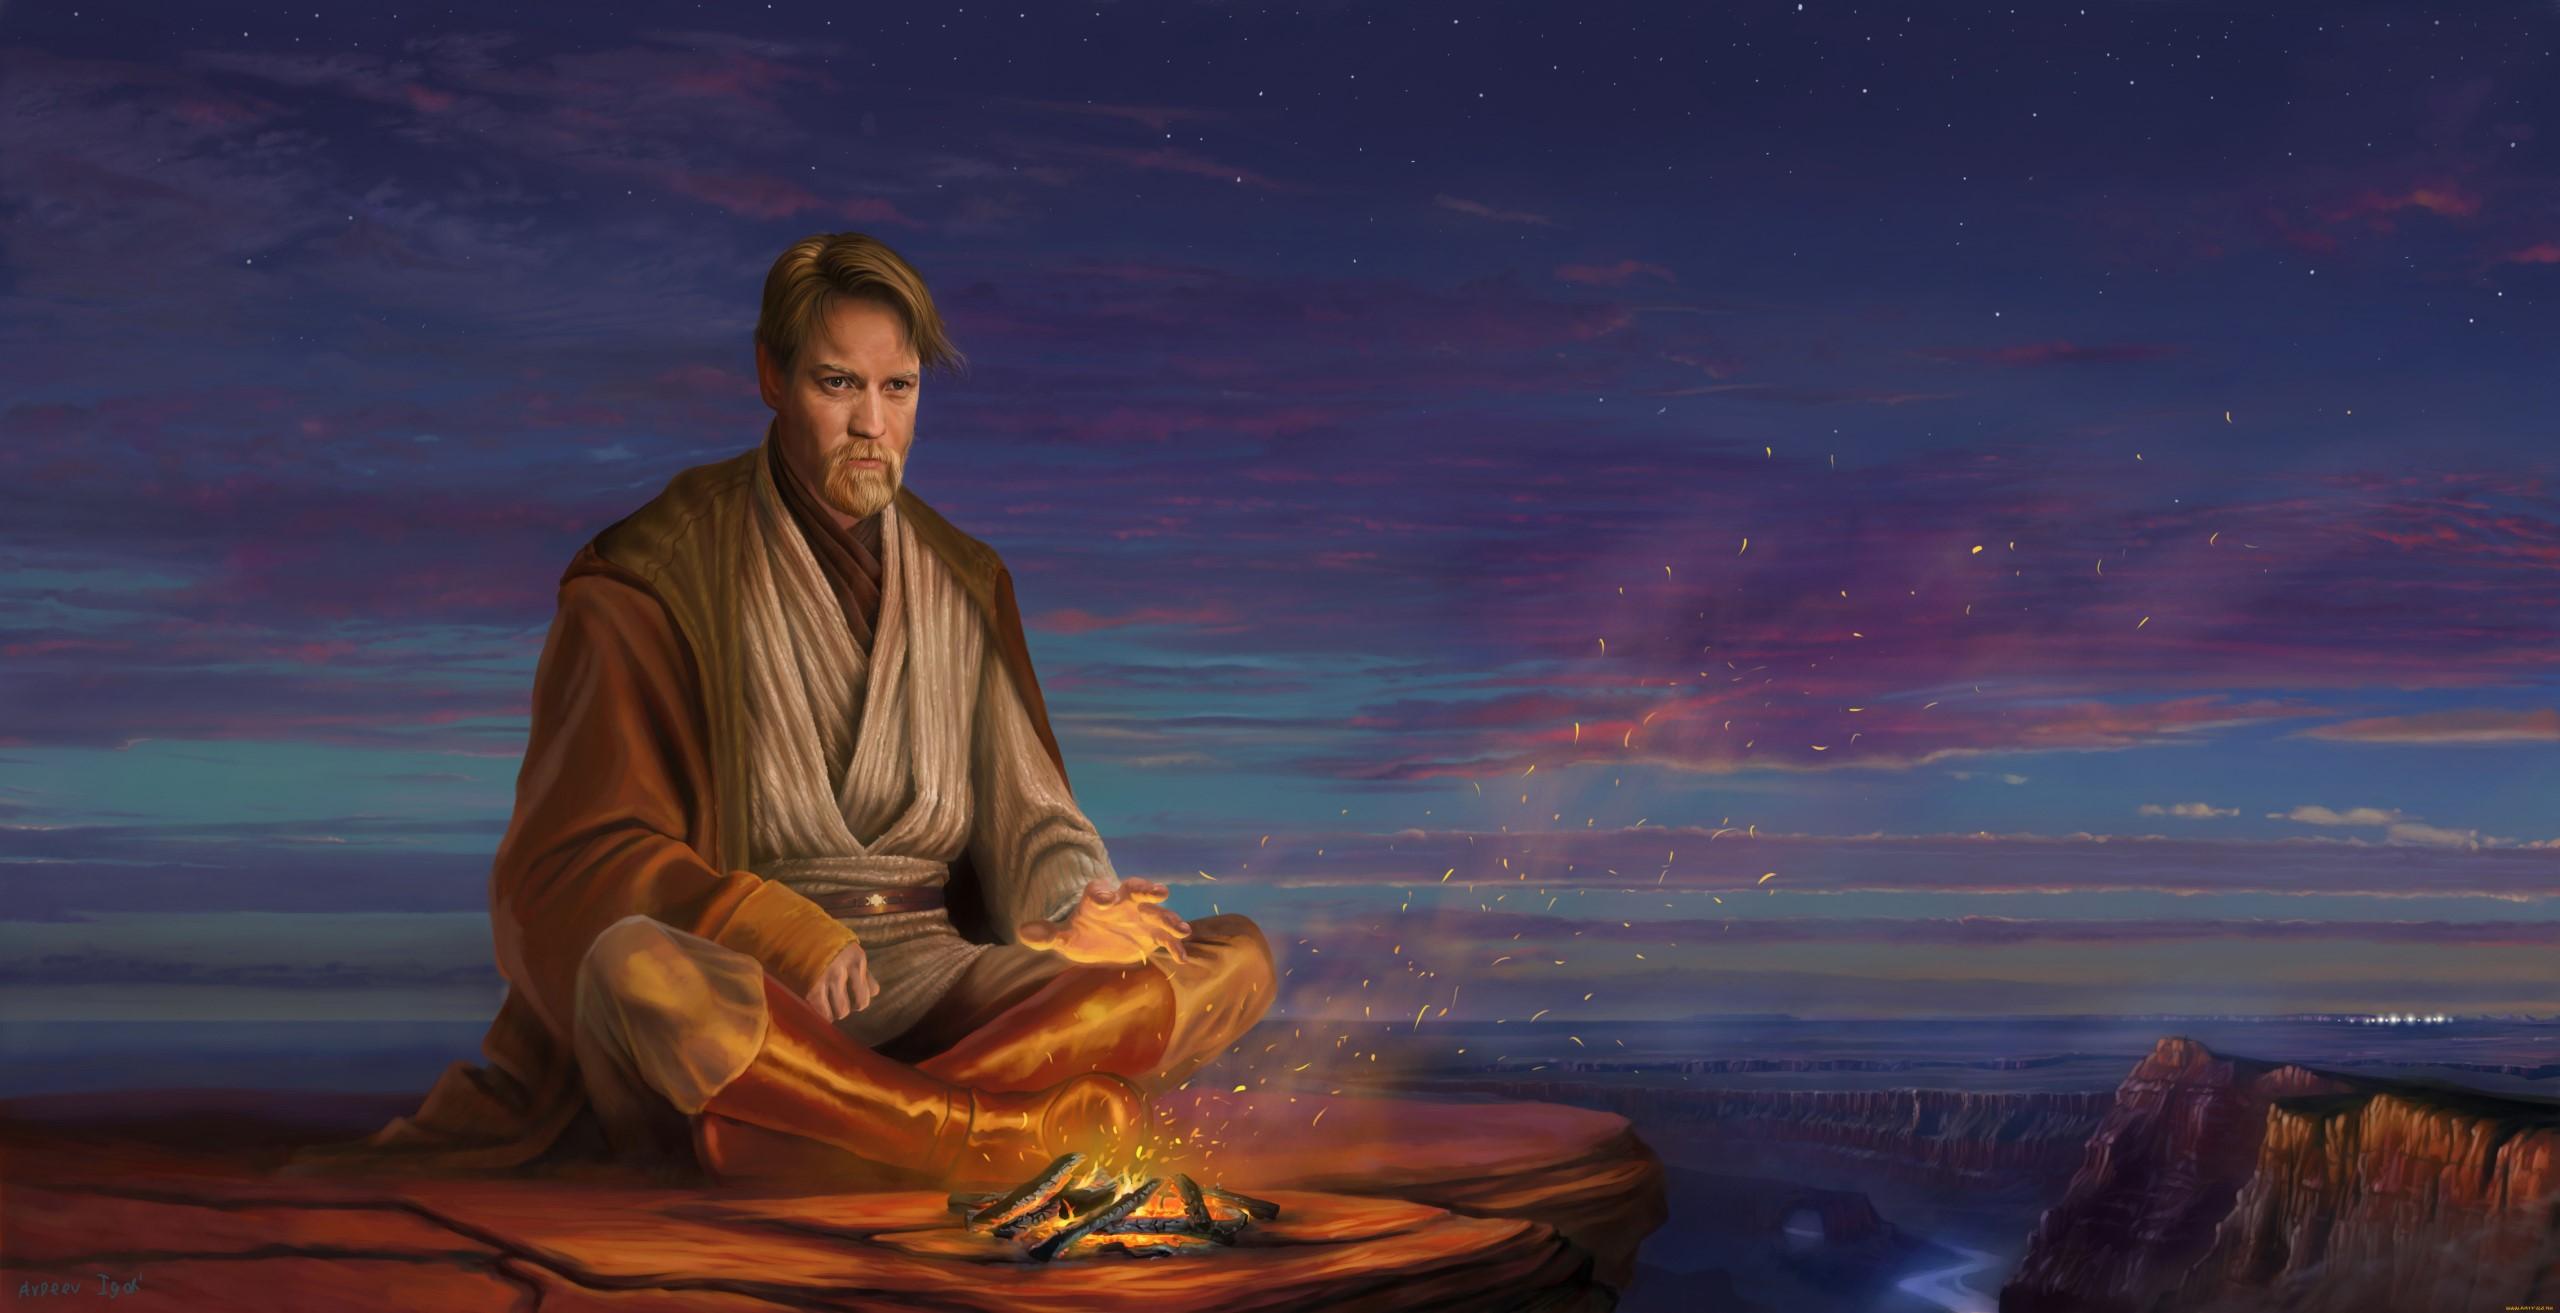 Wallpaper Star Wars Heroes Artwork Jedi Obi Wan Kenobi